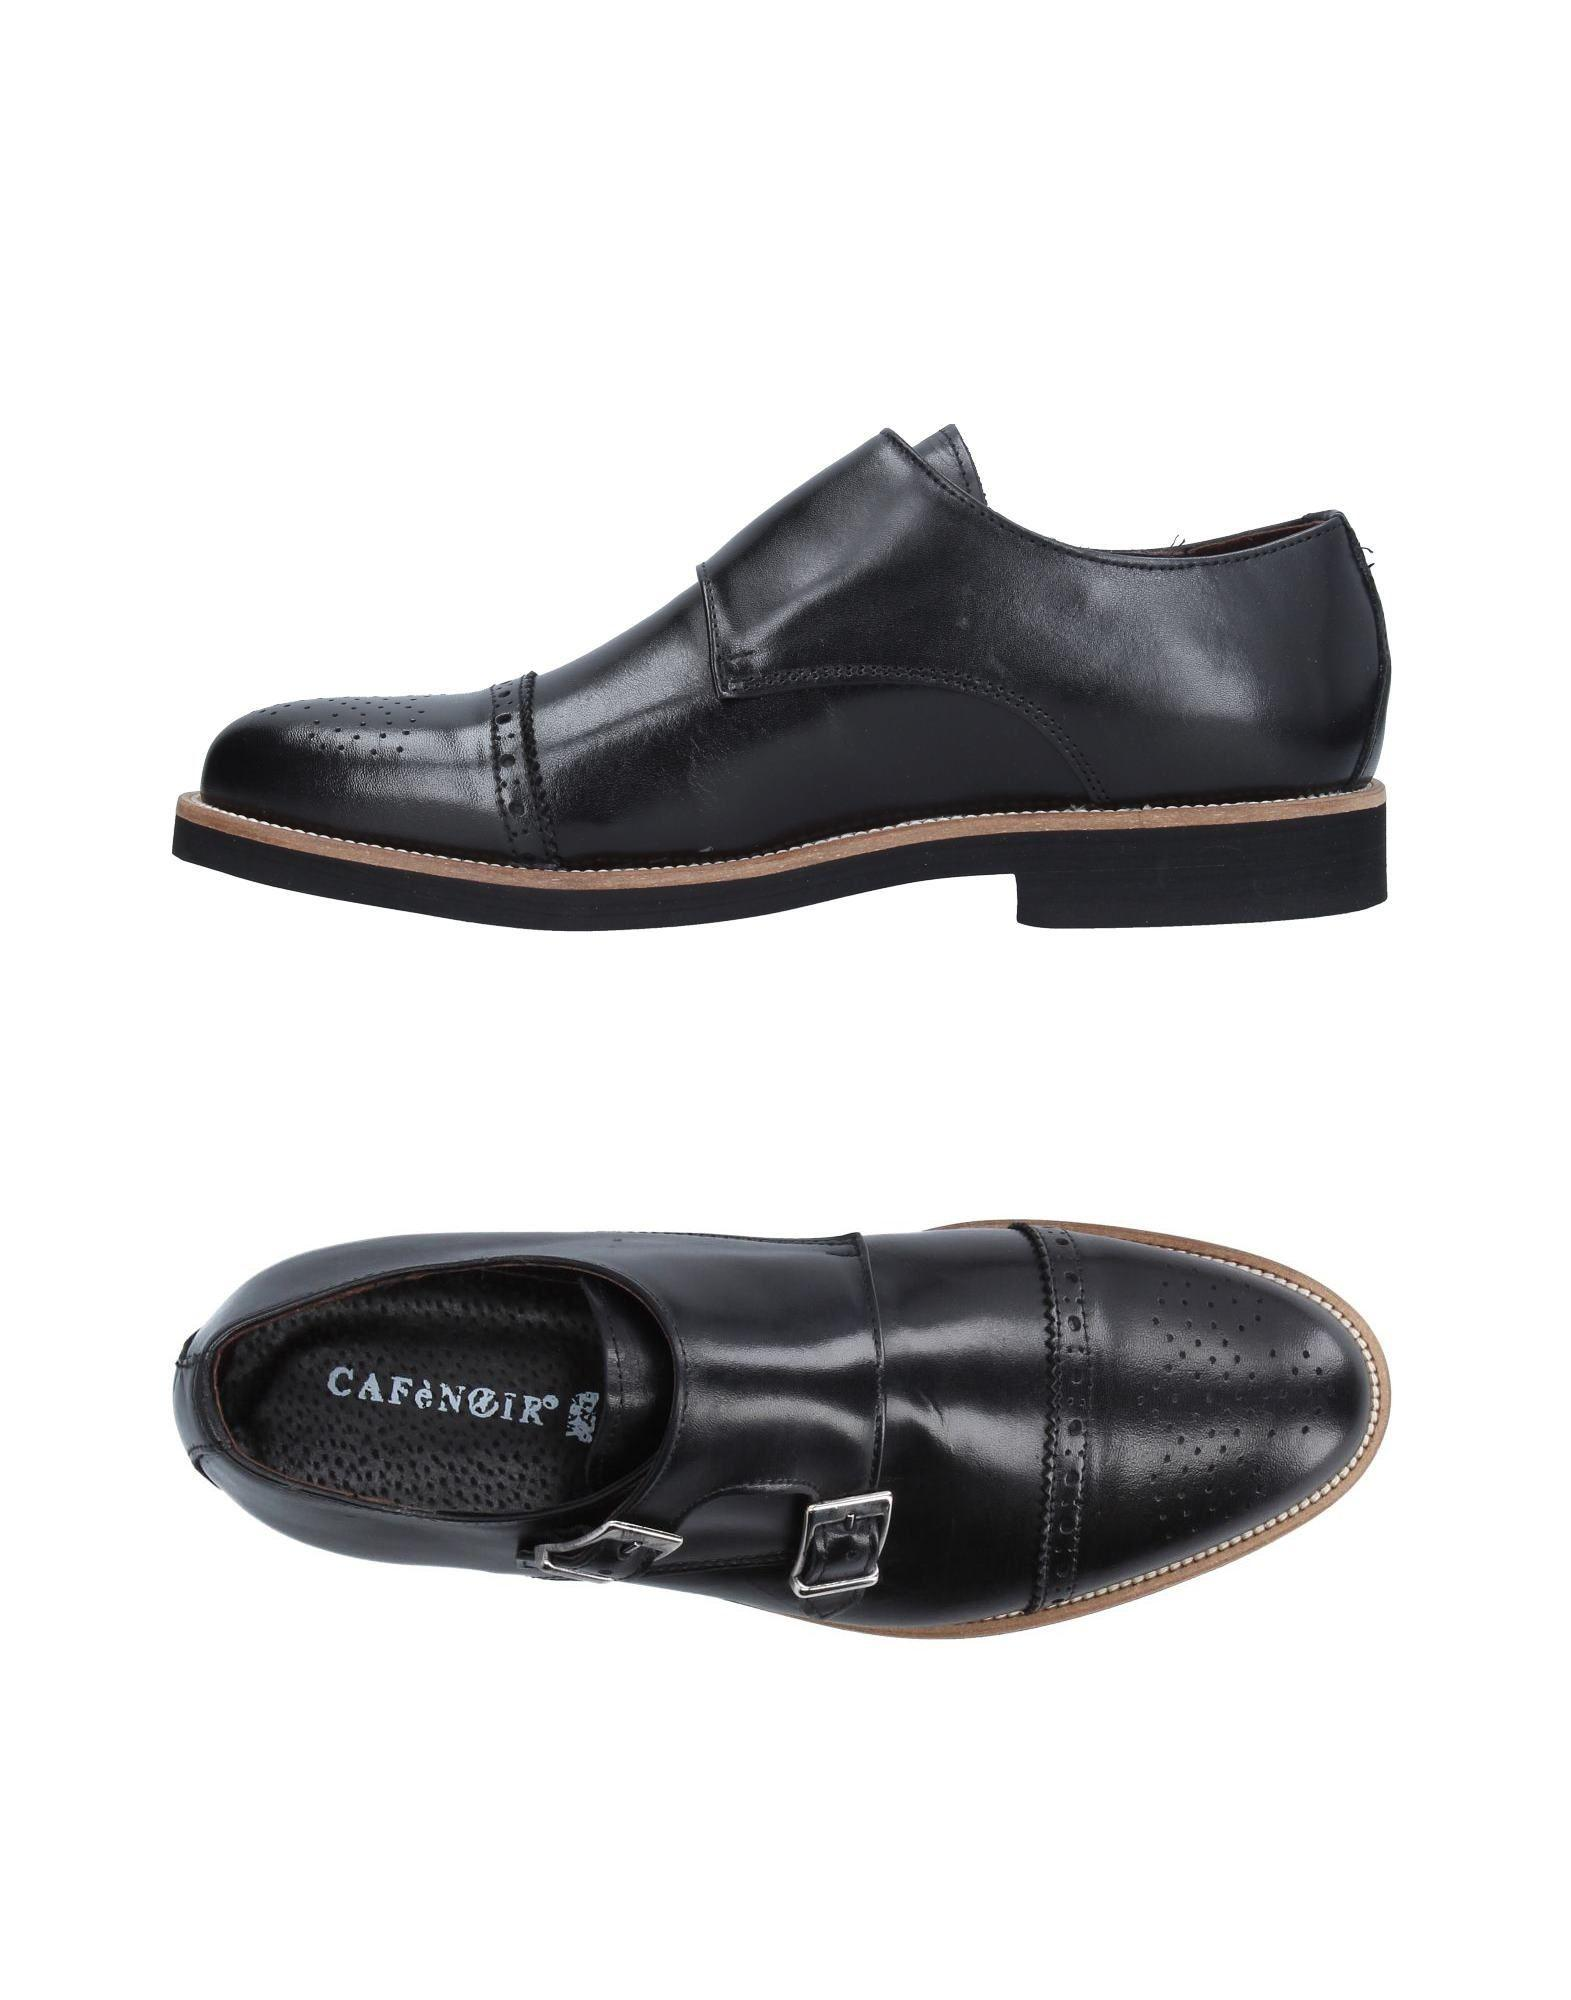 FOOTWEAR - Loafers Caf klqqkr5Gt